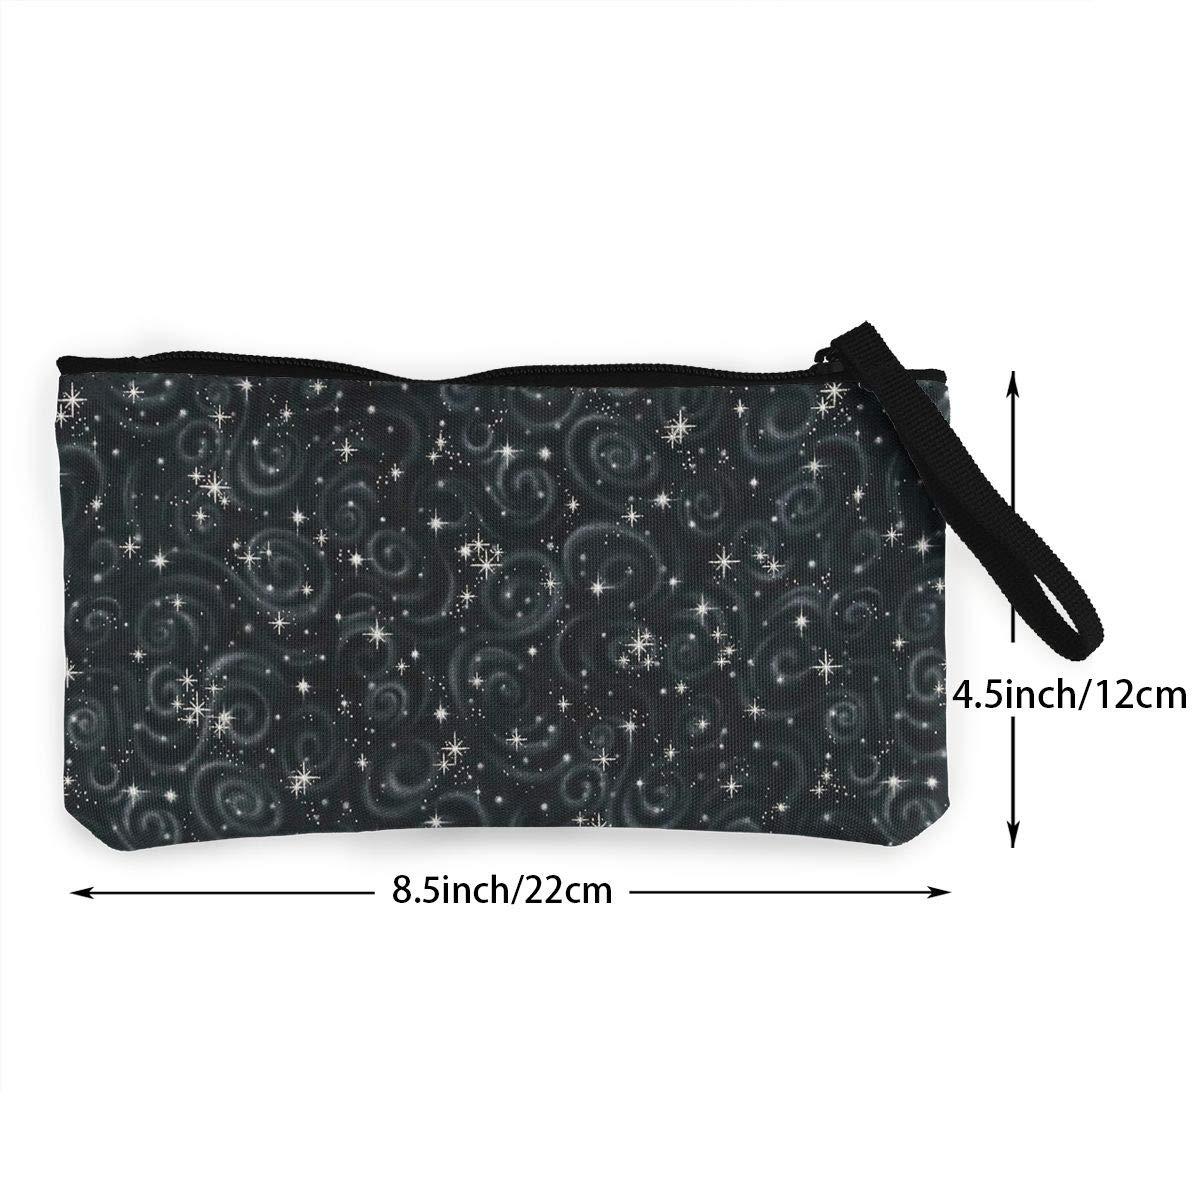 DH14hjsdDEE Black Stargazers Star Texture Metallic zipper canvas coin purse wallet Cellphone Bag With Handle Make Up Bag